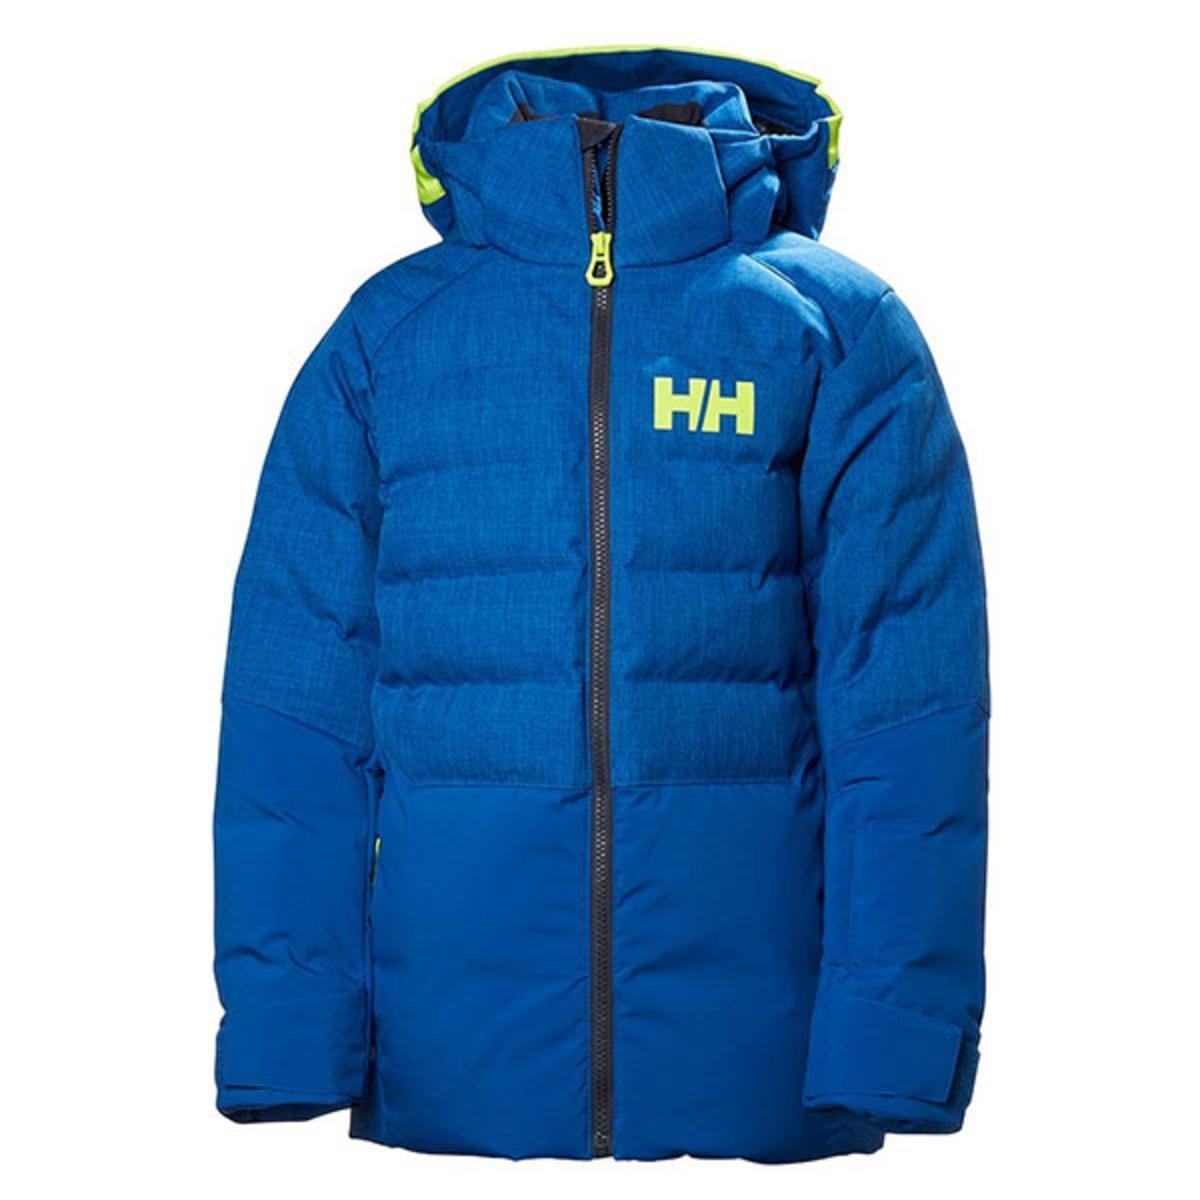 beställa fabriksgiltig förboka Helly Hansen Junior North Down Jacket | Conquer the Cold with ...